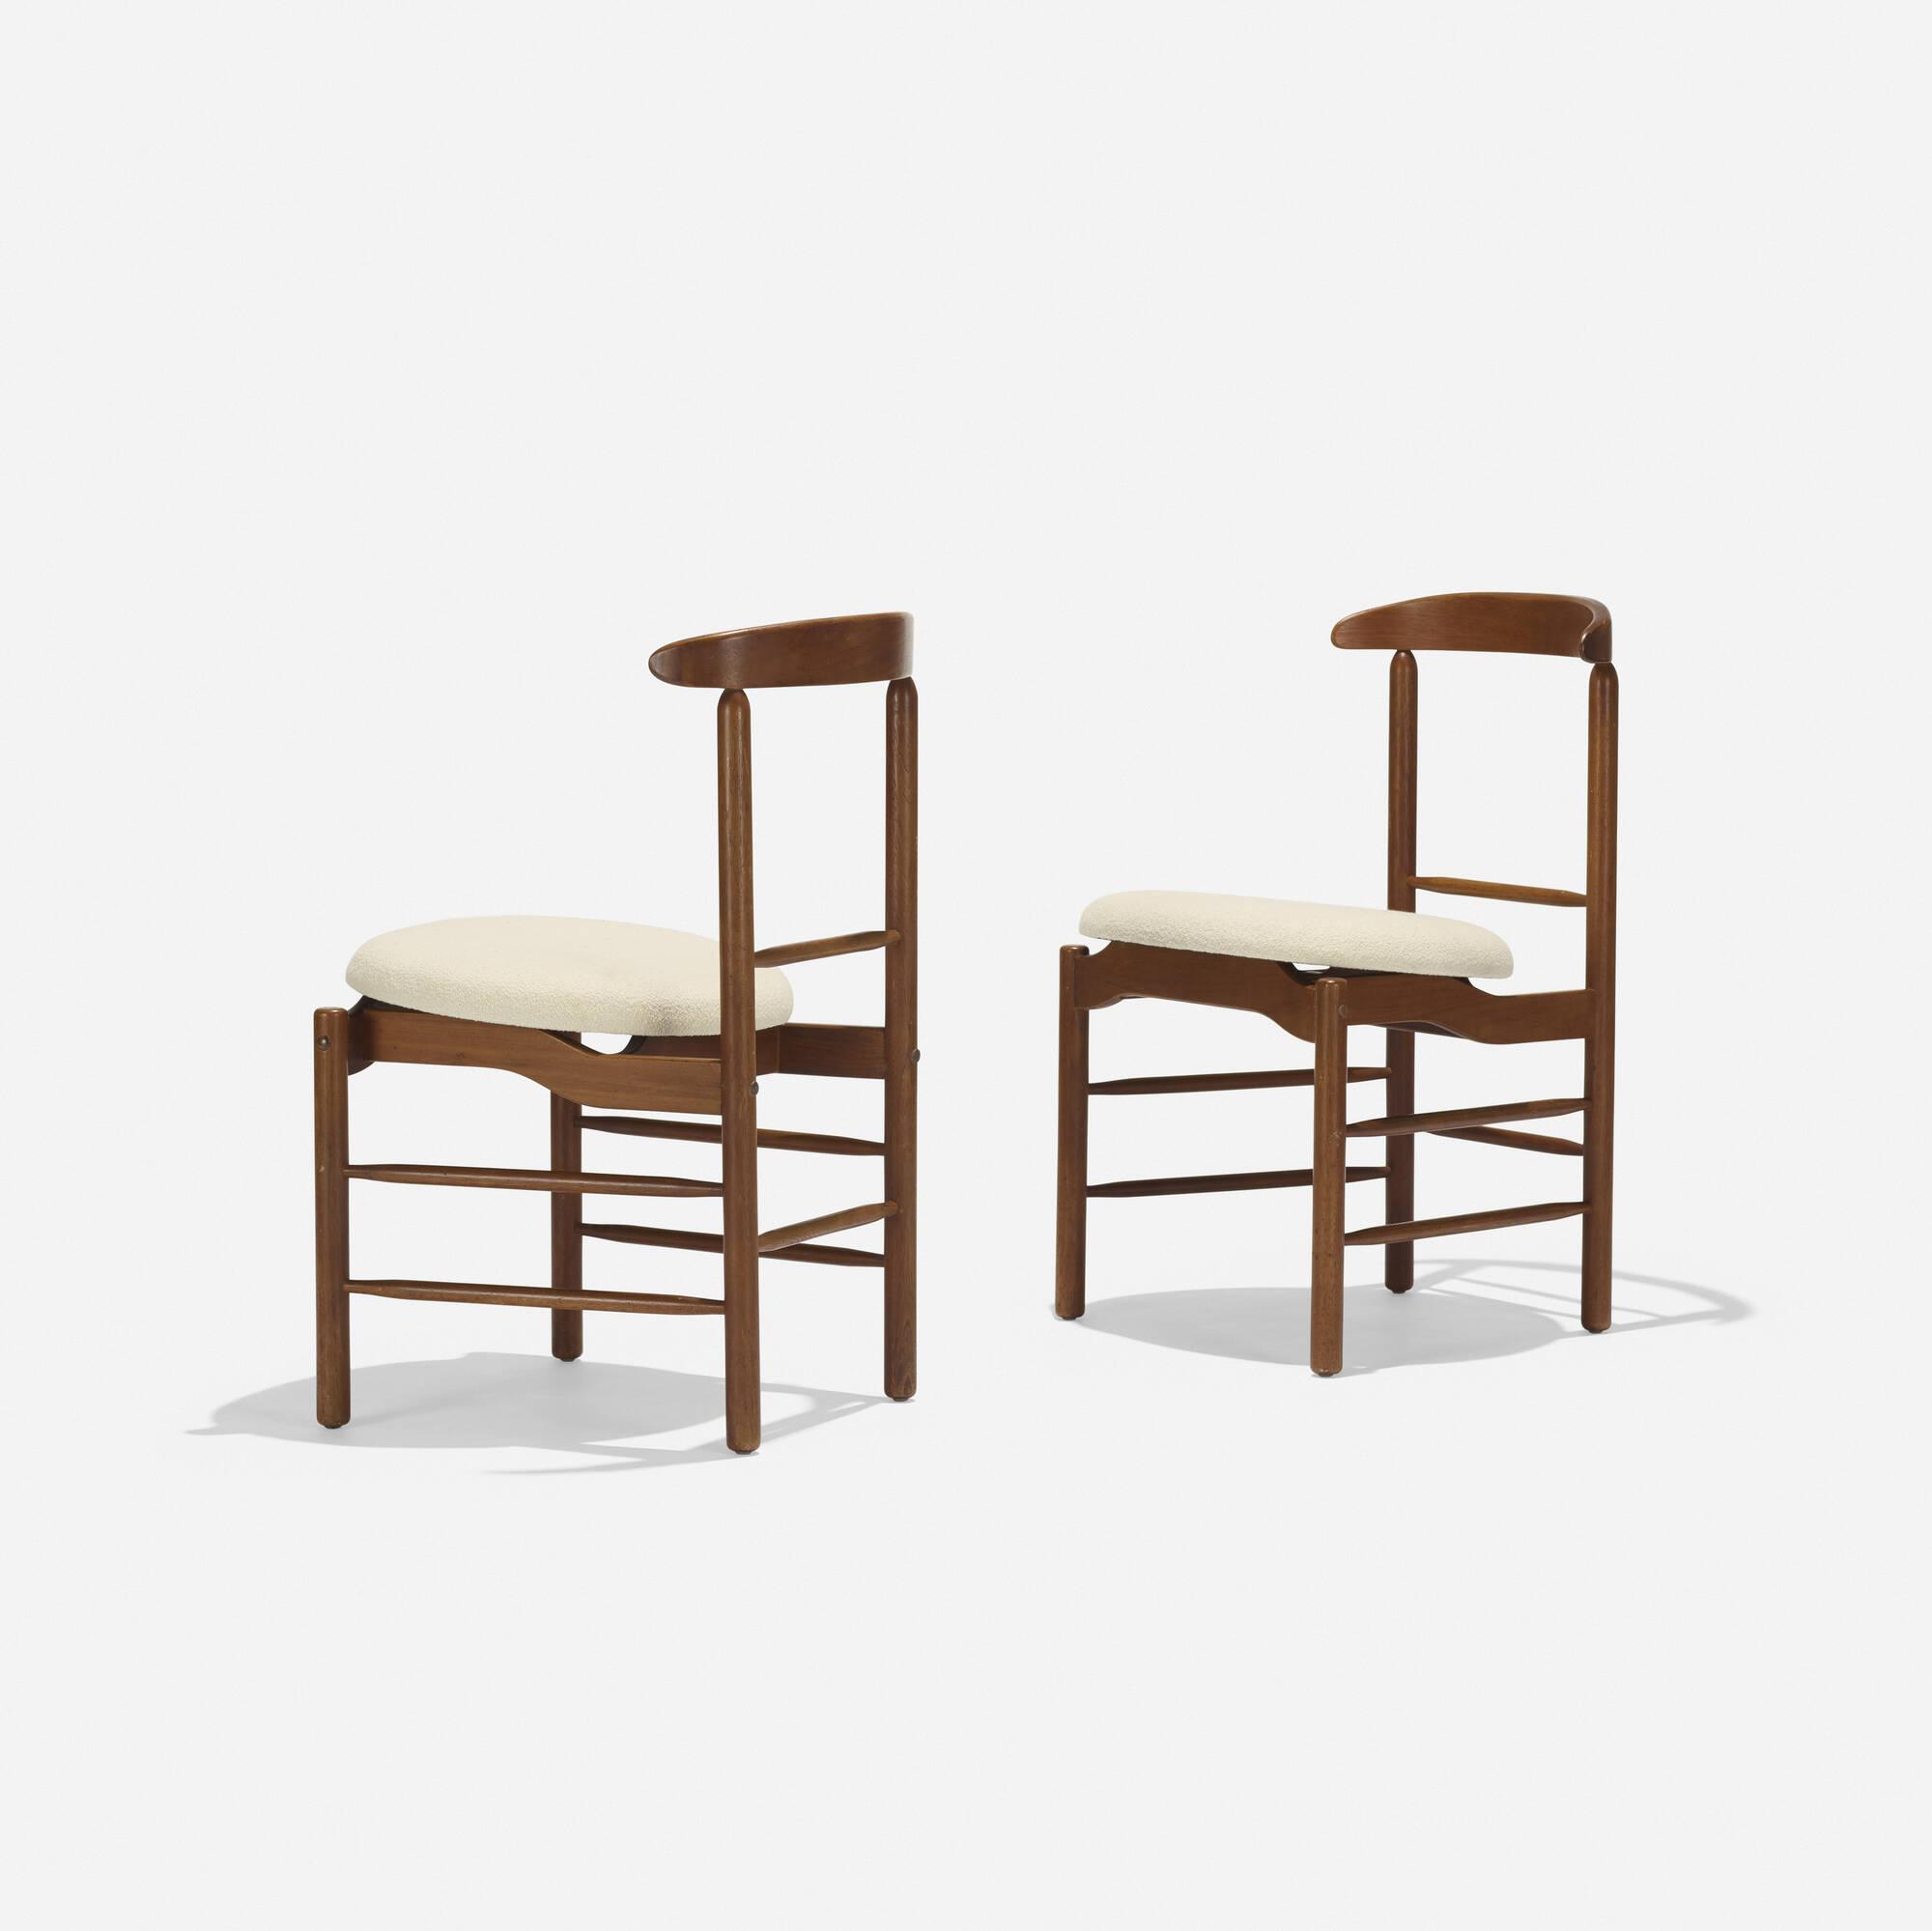 224: Greta Magnusson Grossman / dining chairs, pair (2 of 3)